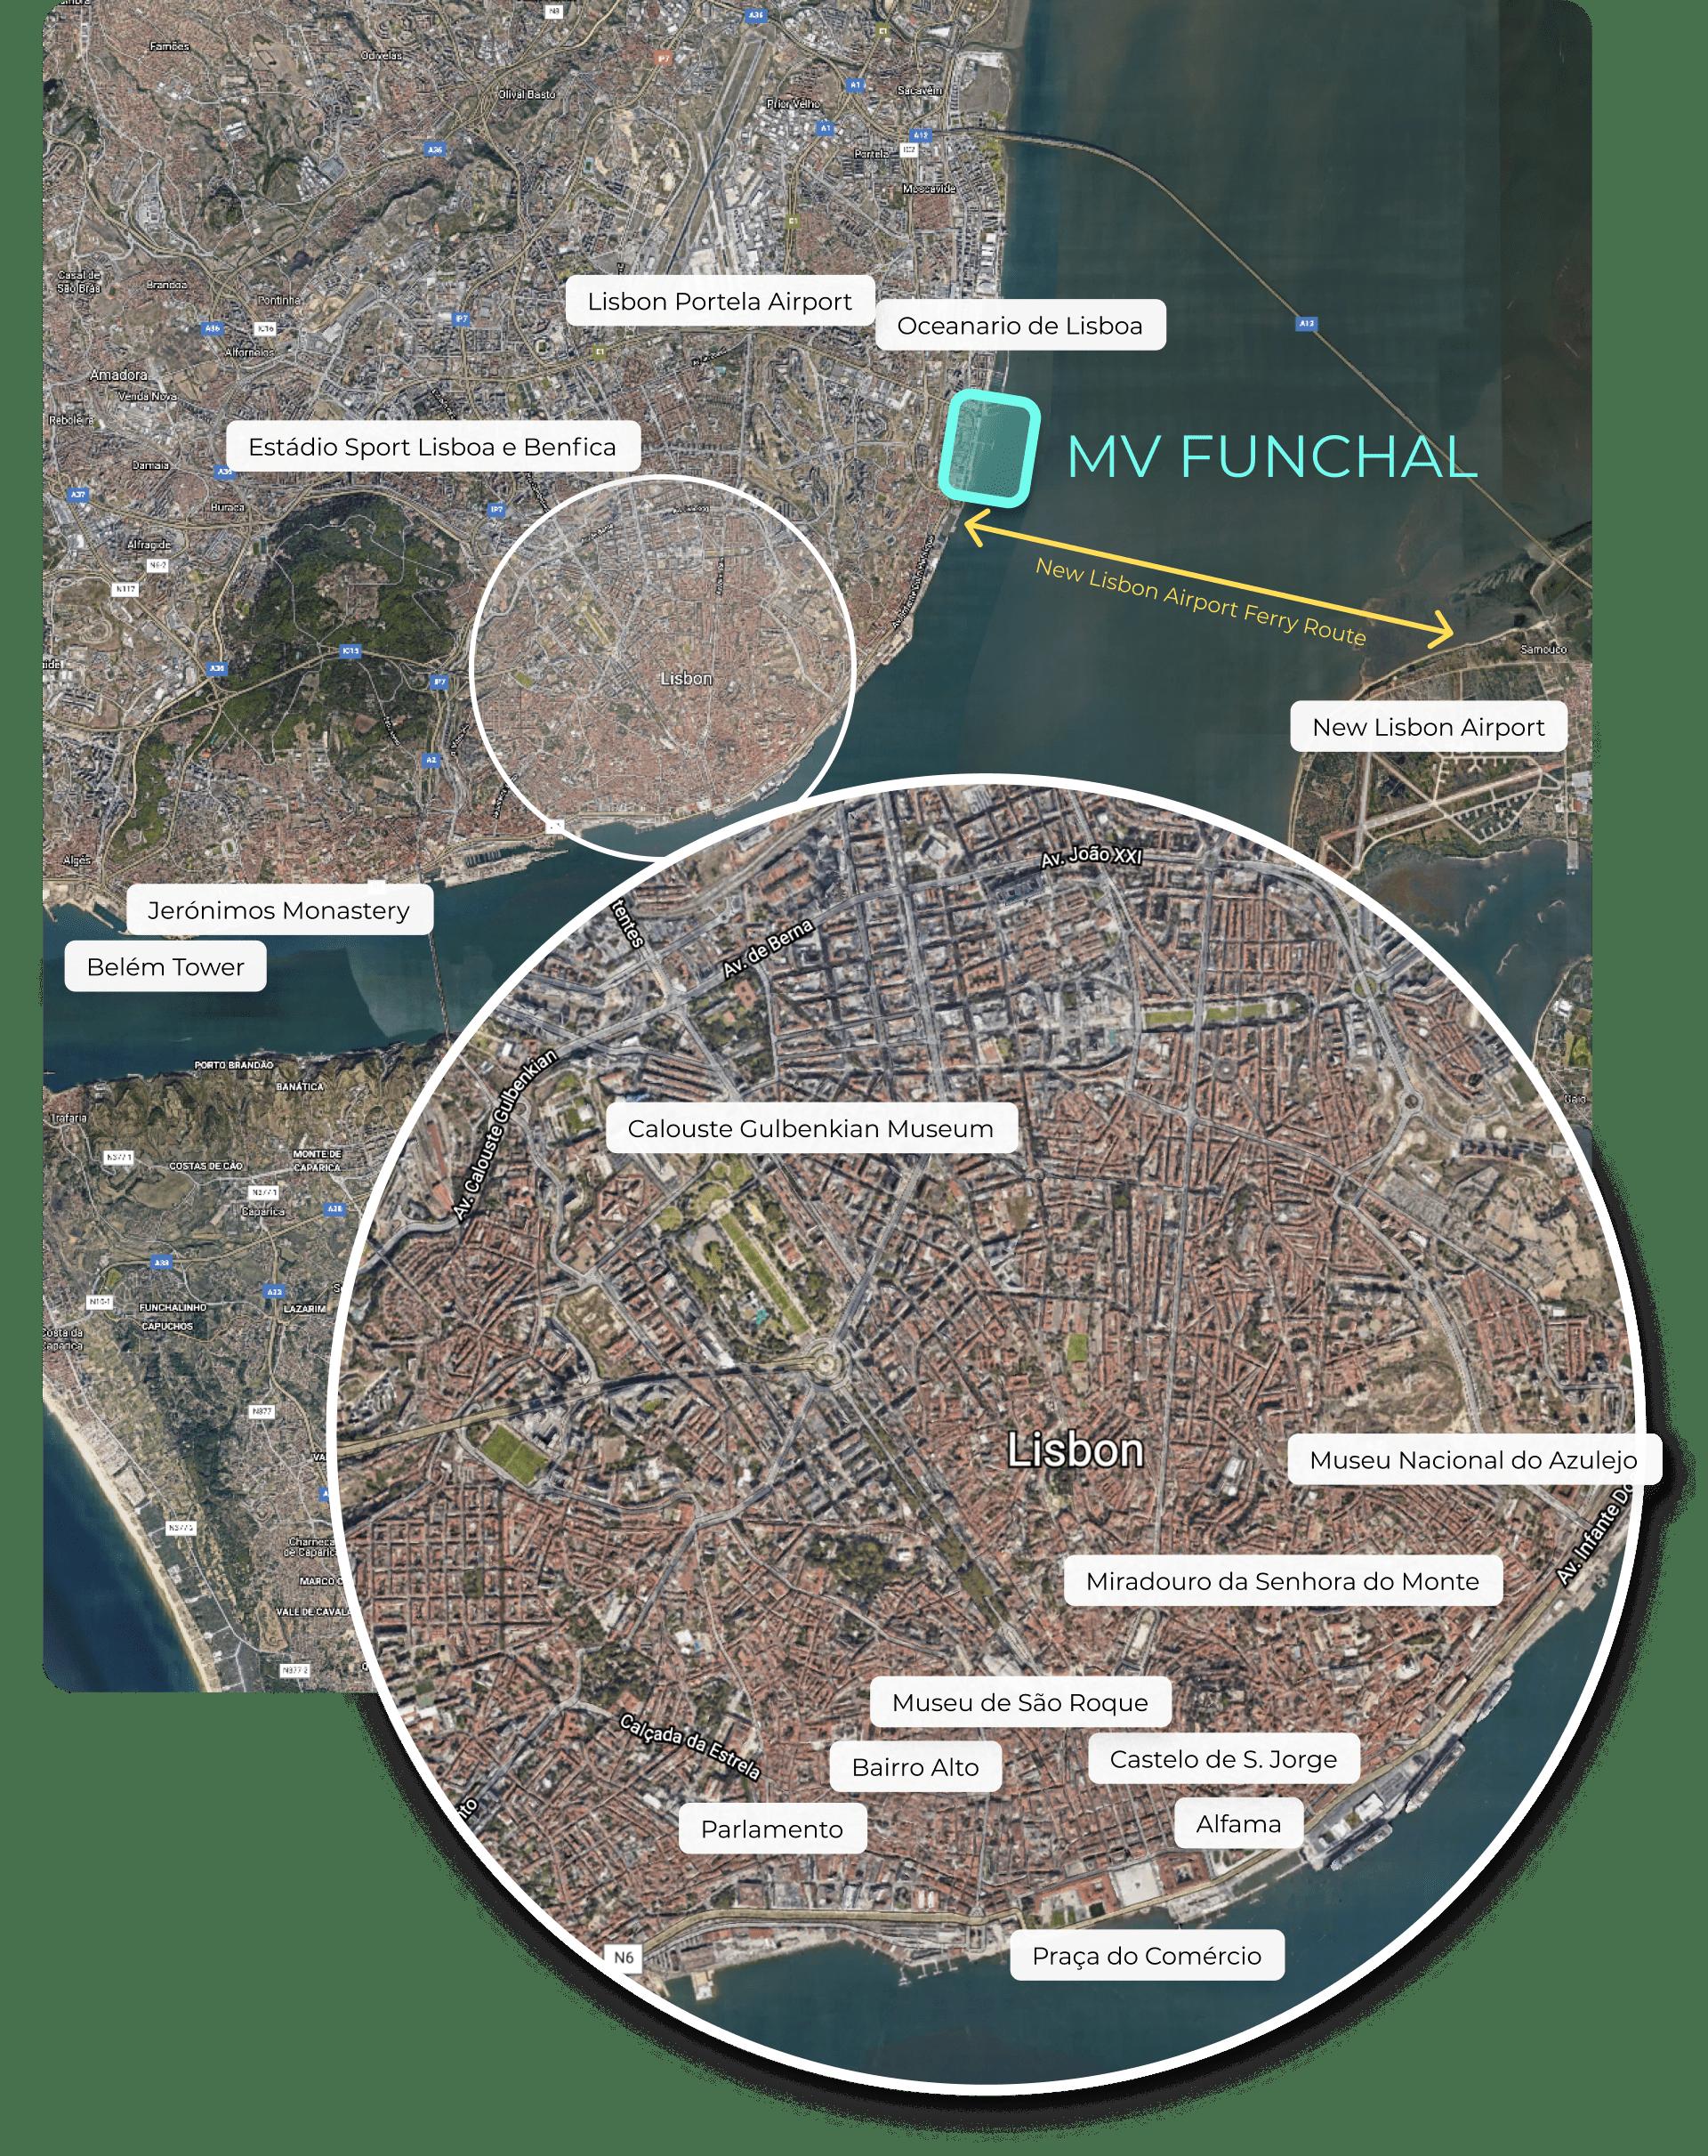 Map of Lisbon